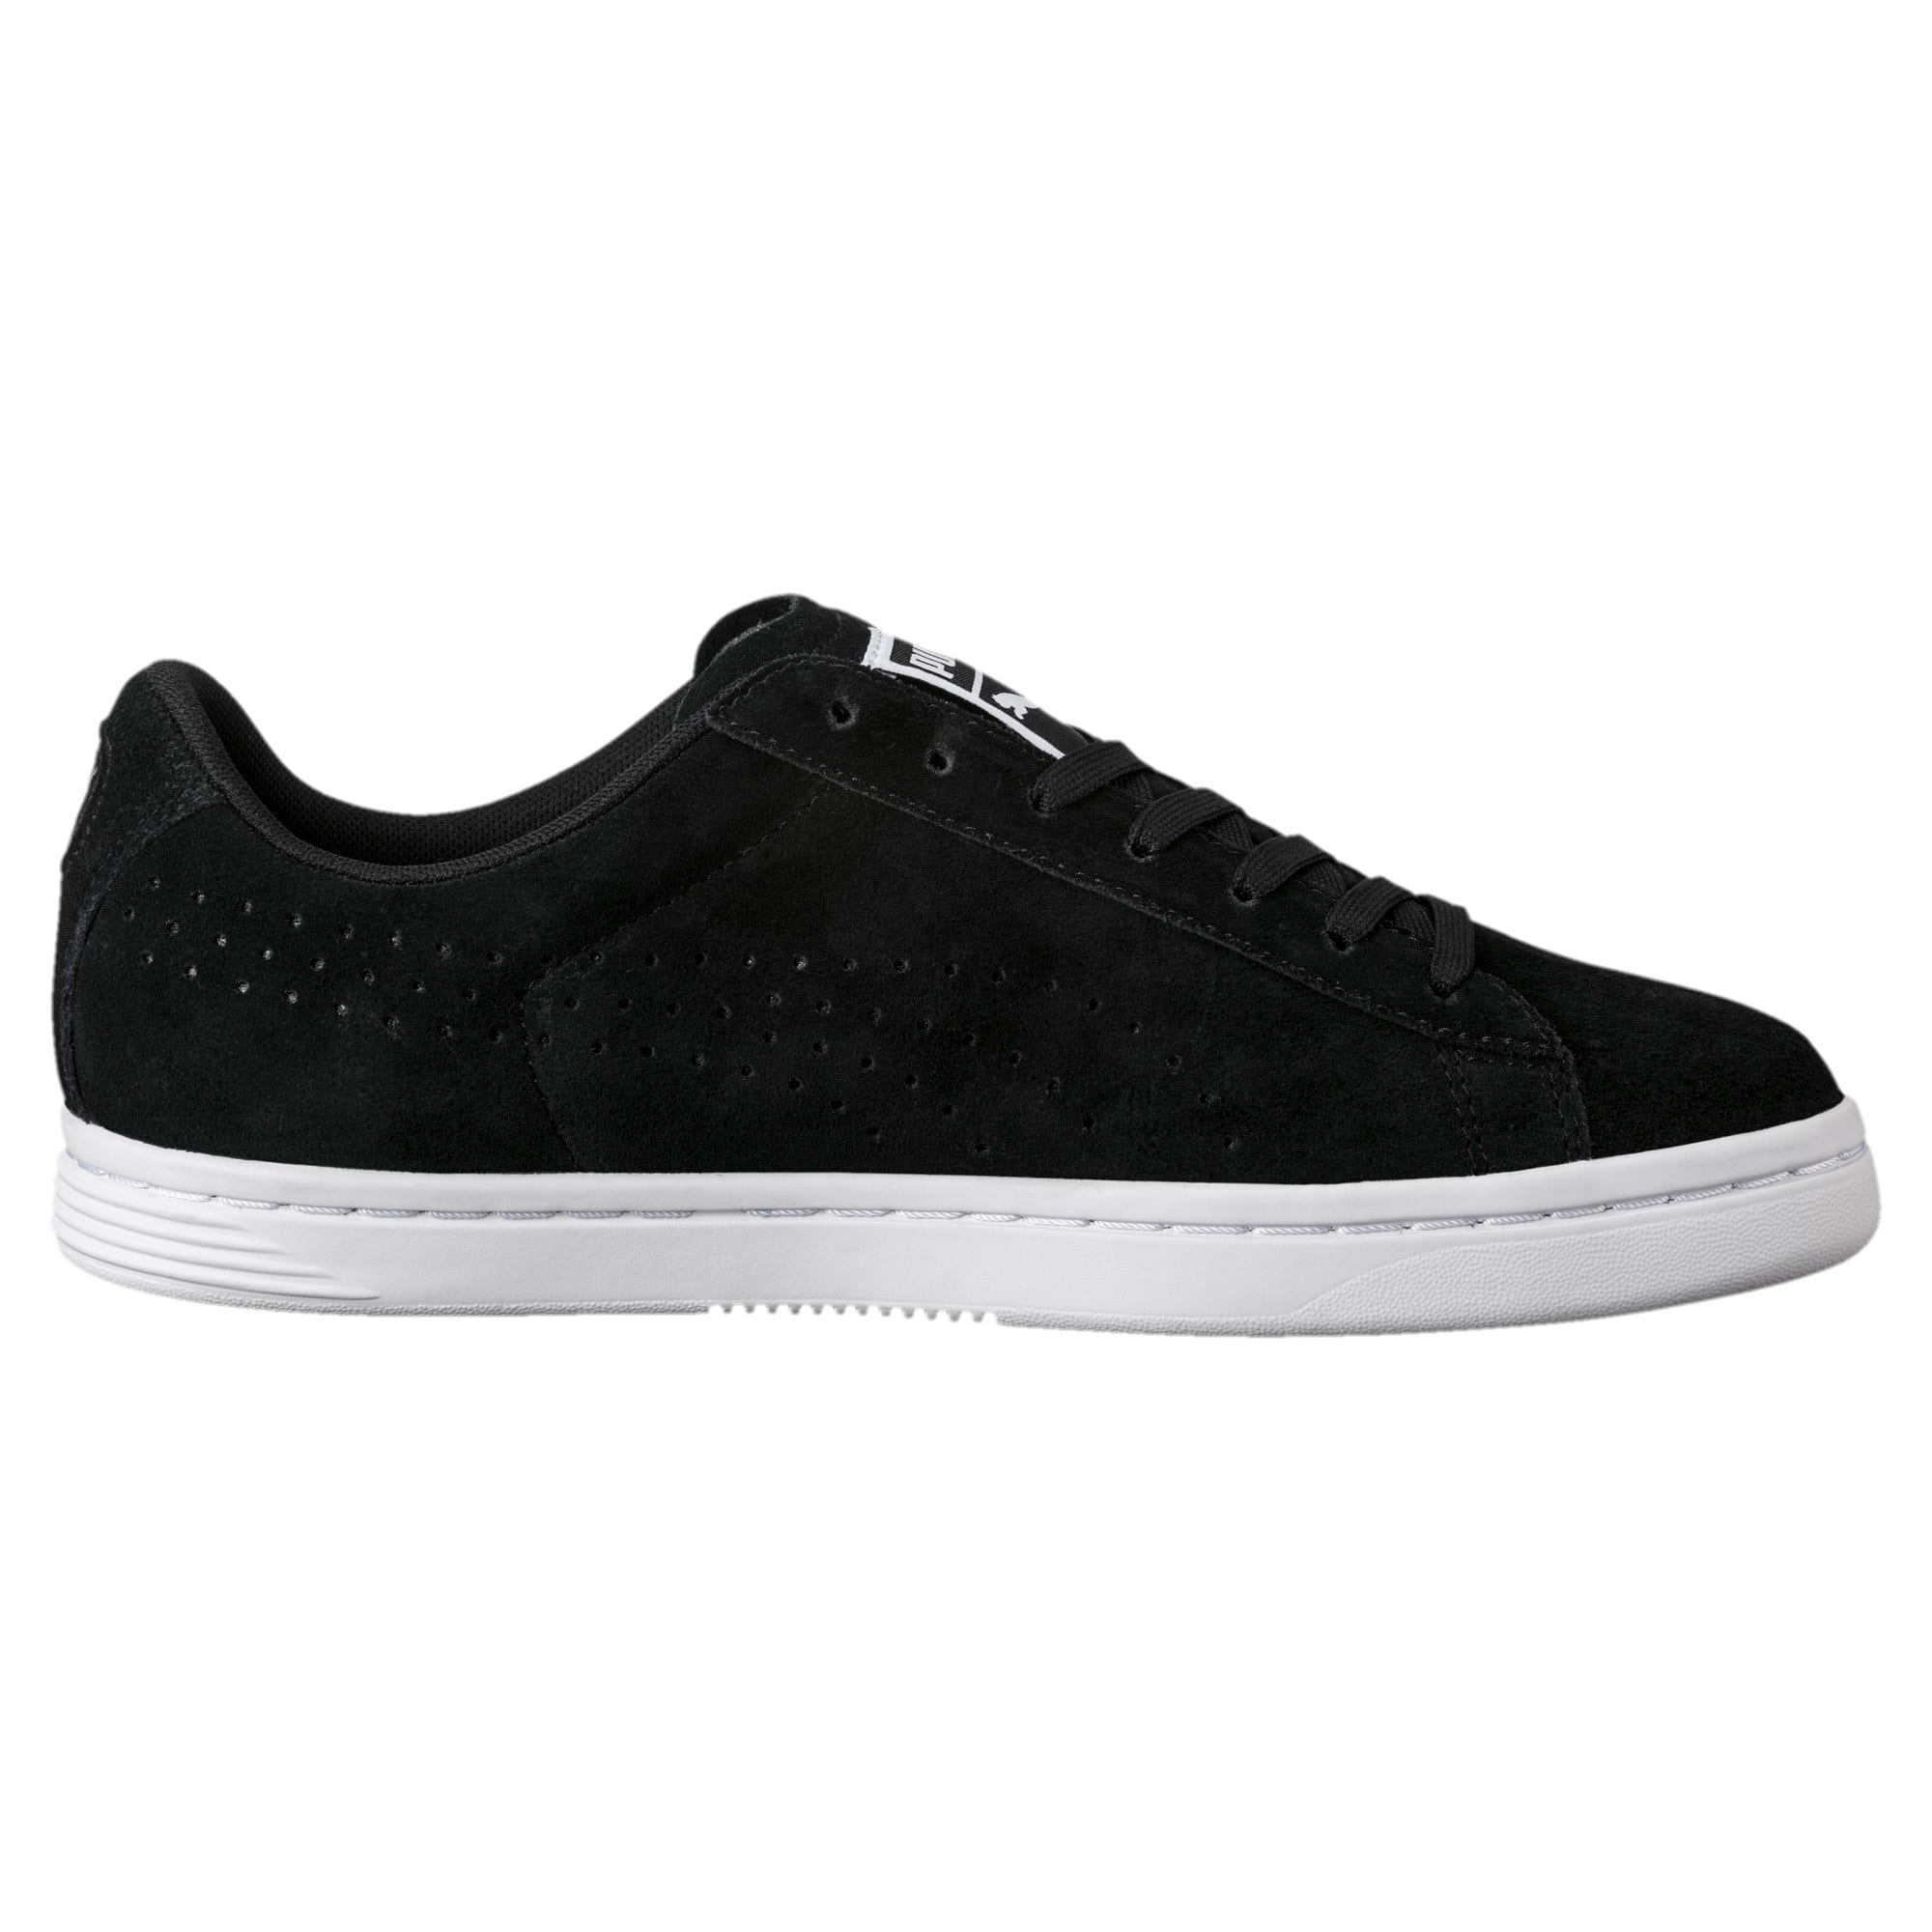 Thumbnail 3 of Court Star Suede Sneakers, Puma Black, medium